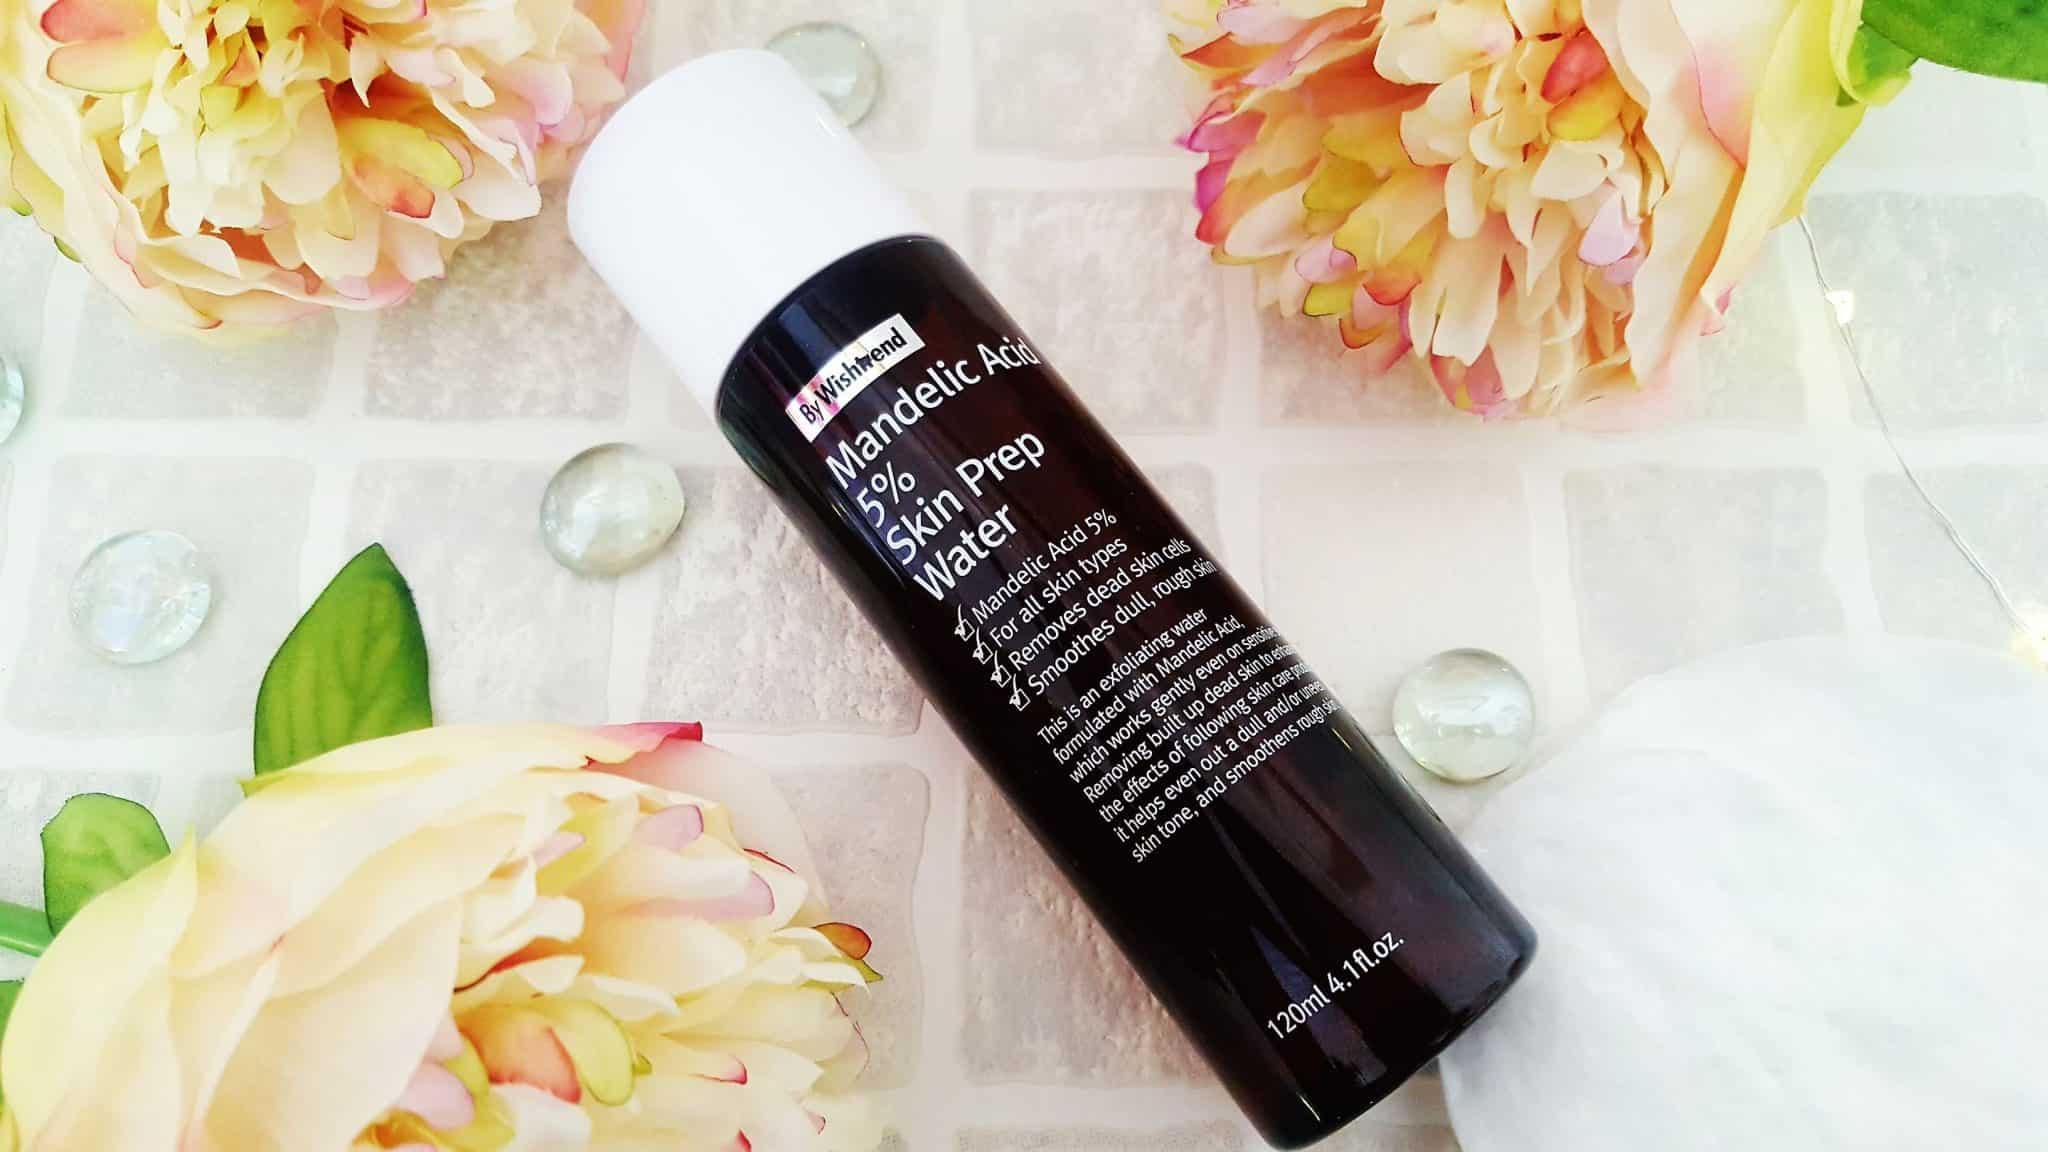 mandelic-acid-skin-prep-water-by-wishtrend-review_www.lisasnotebook.com